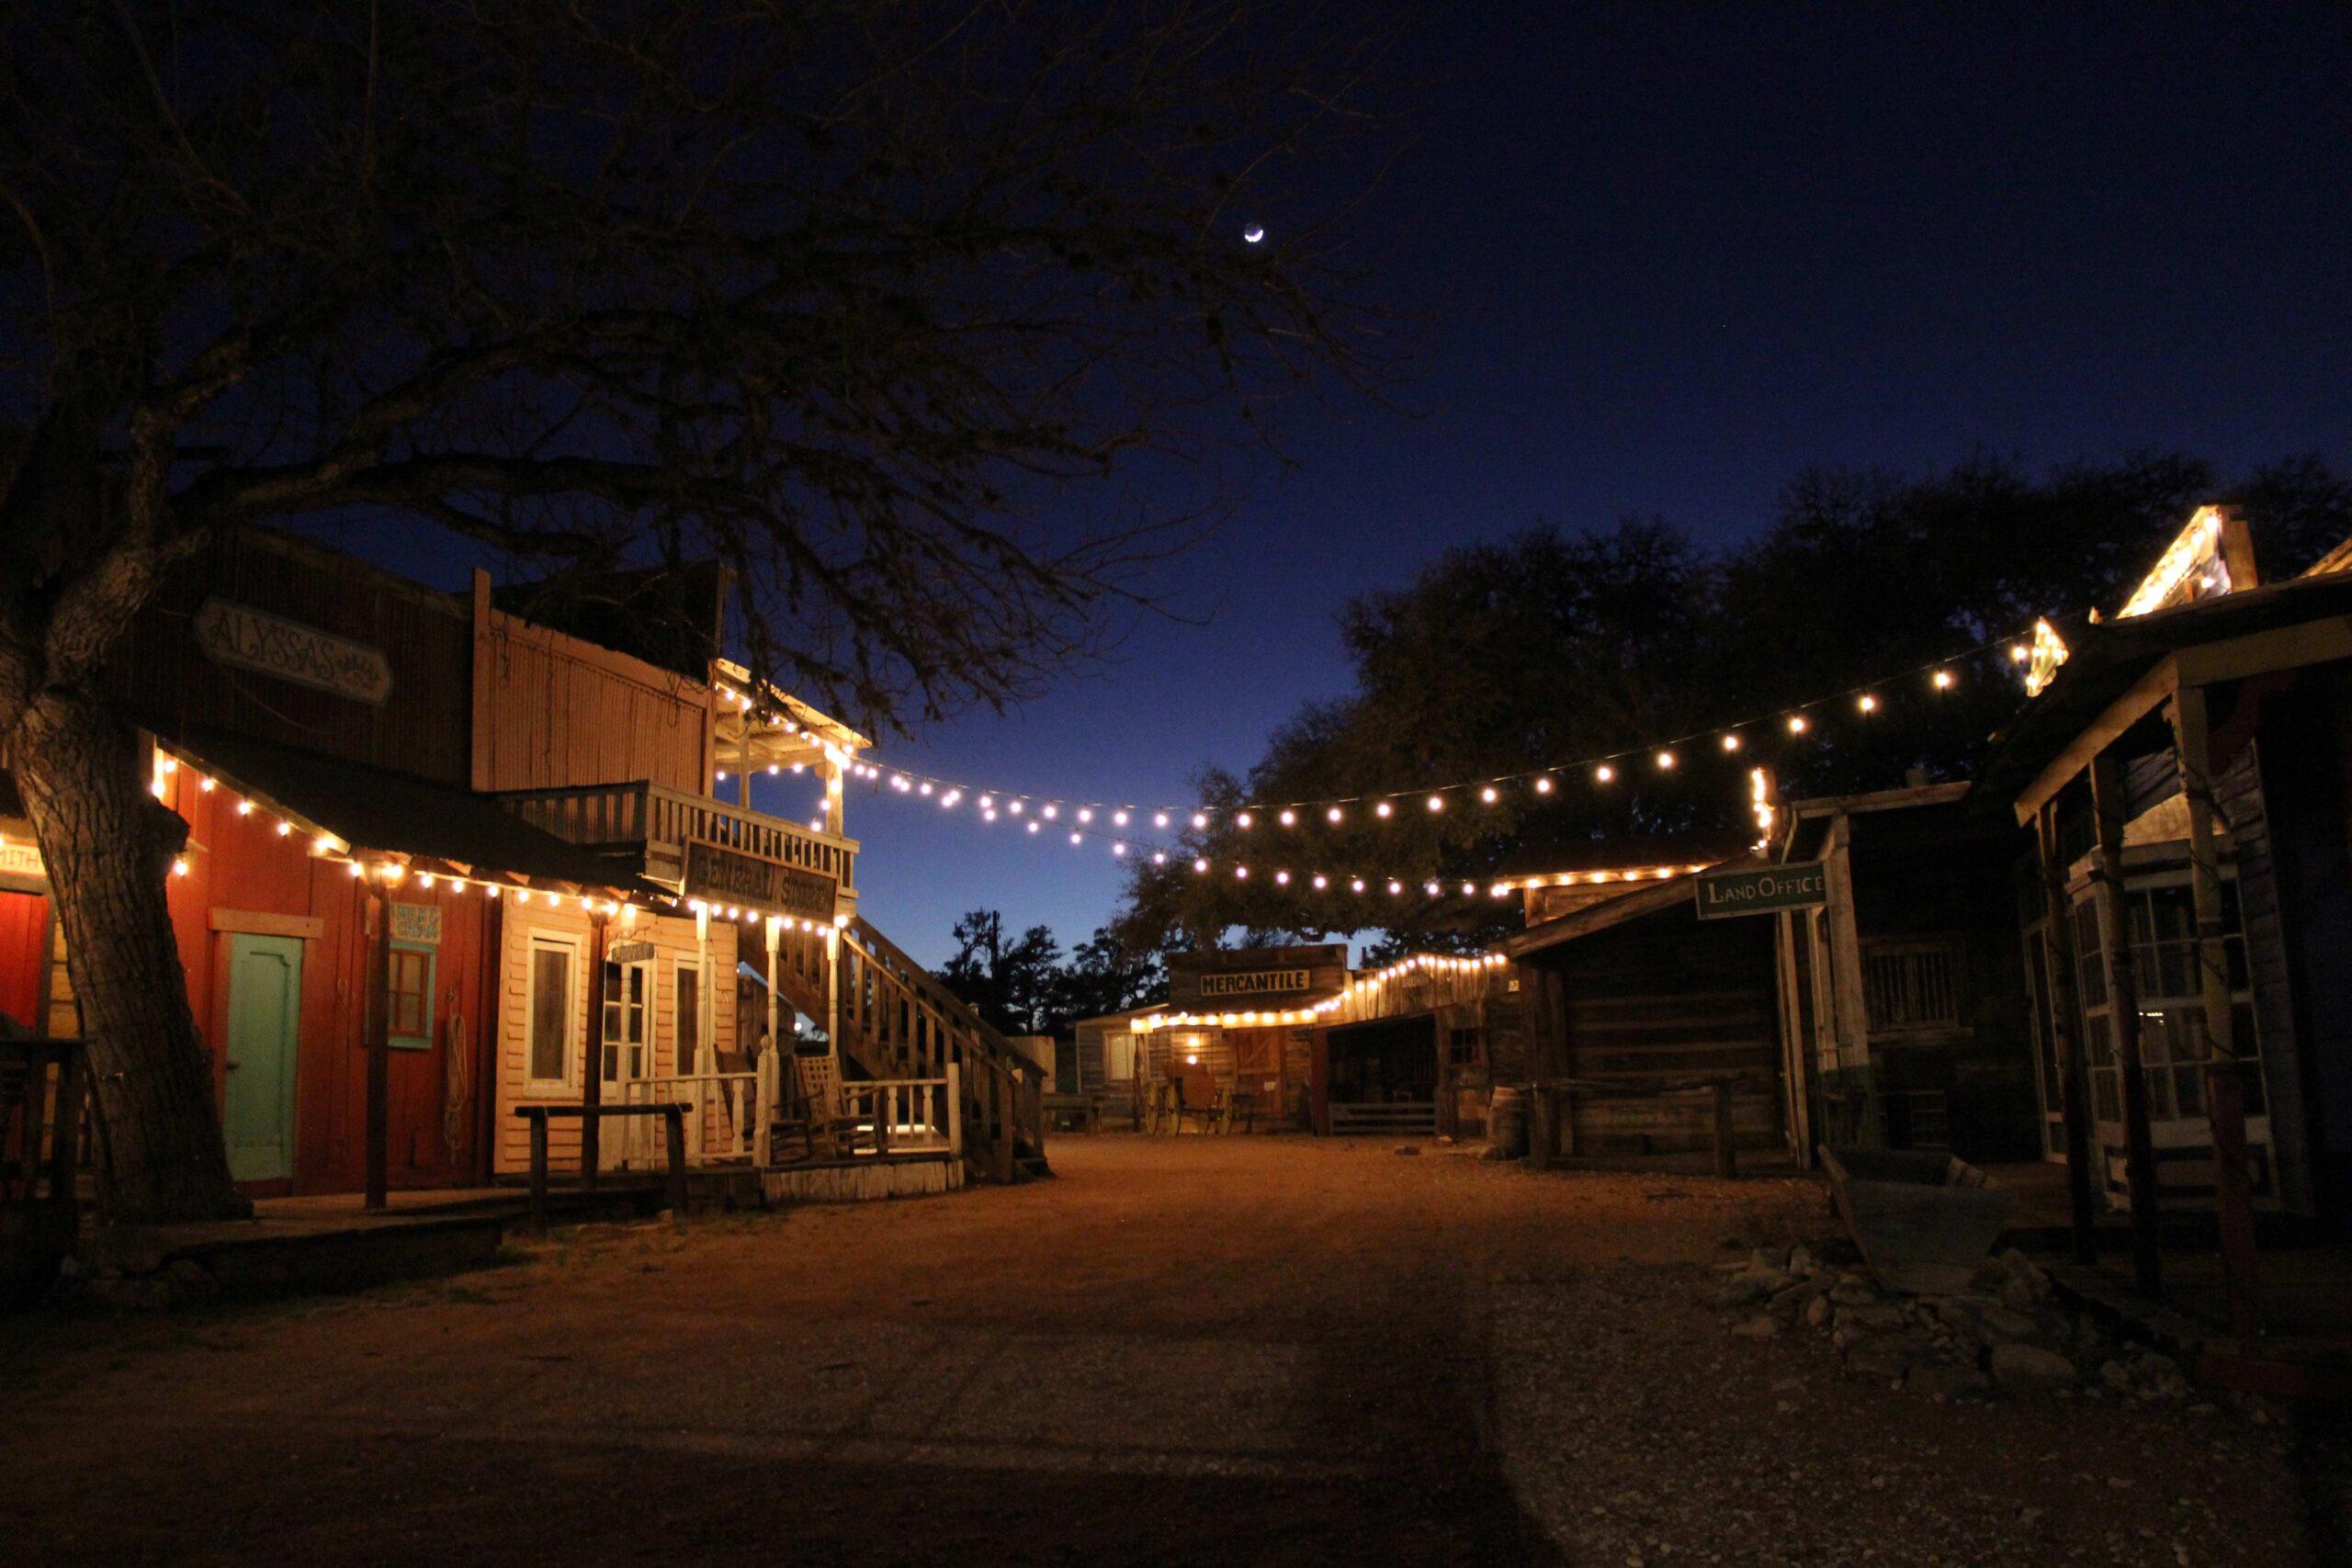 San Antonio Team Building Retreat Corporate Event Venue Enchanted Springs Ranch Hill Country Evenings